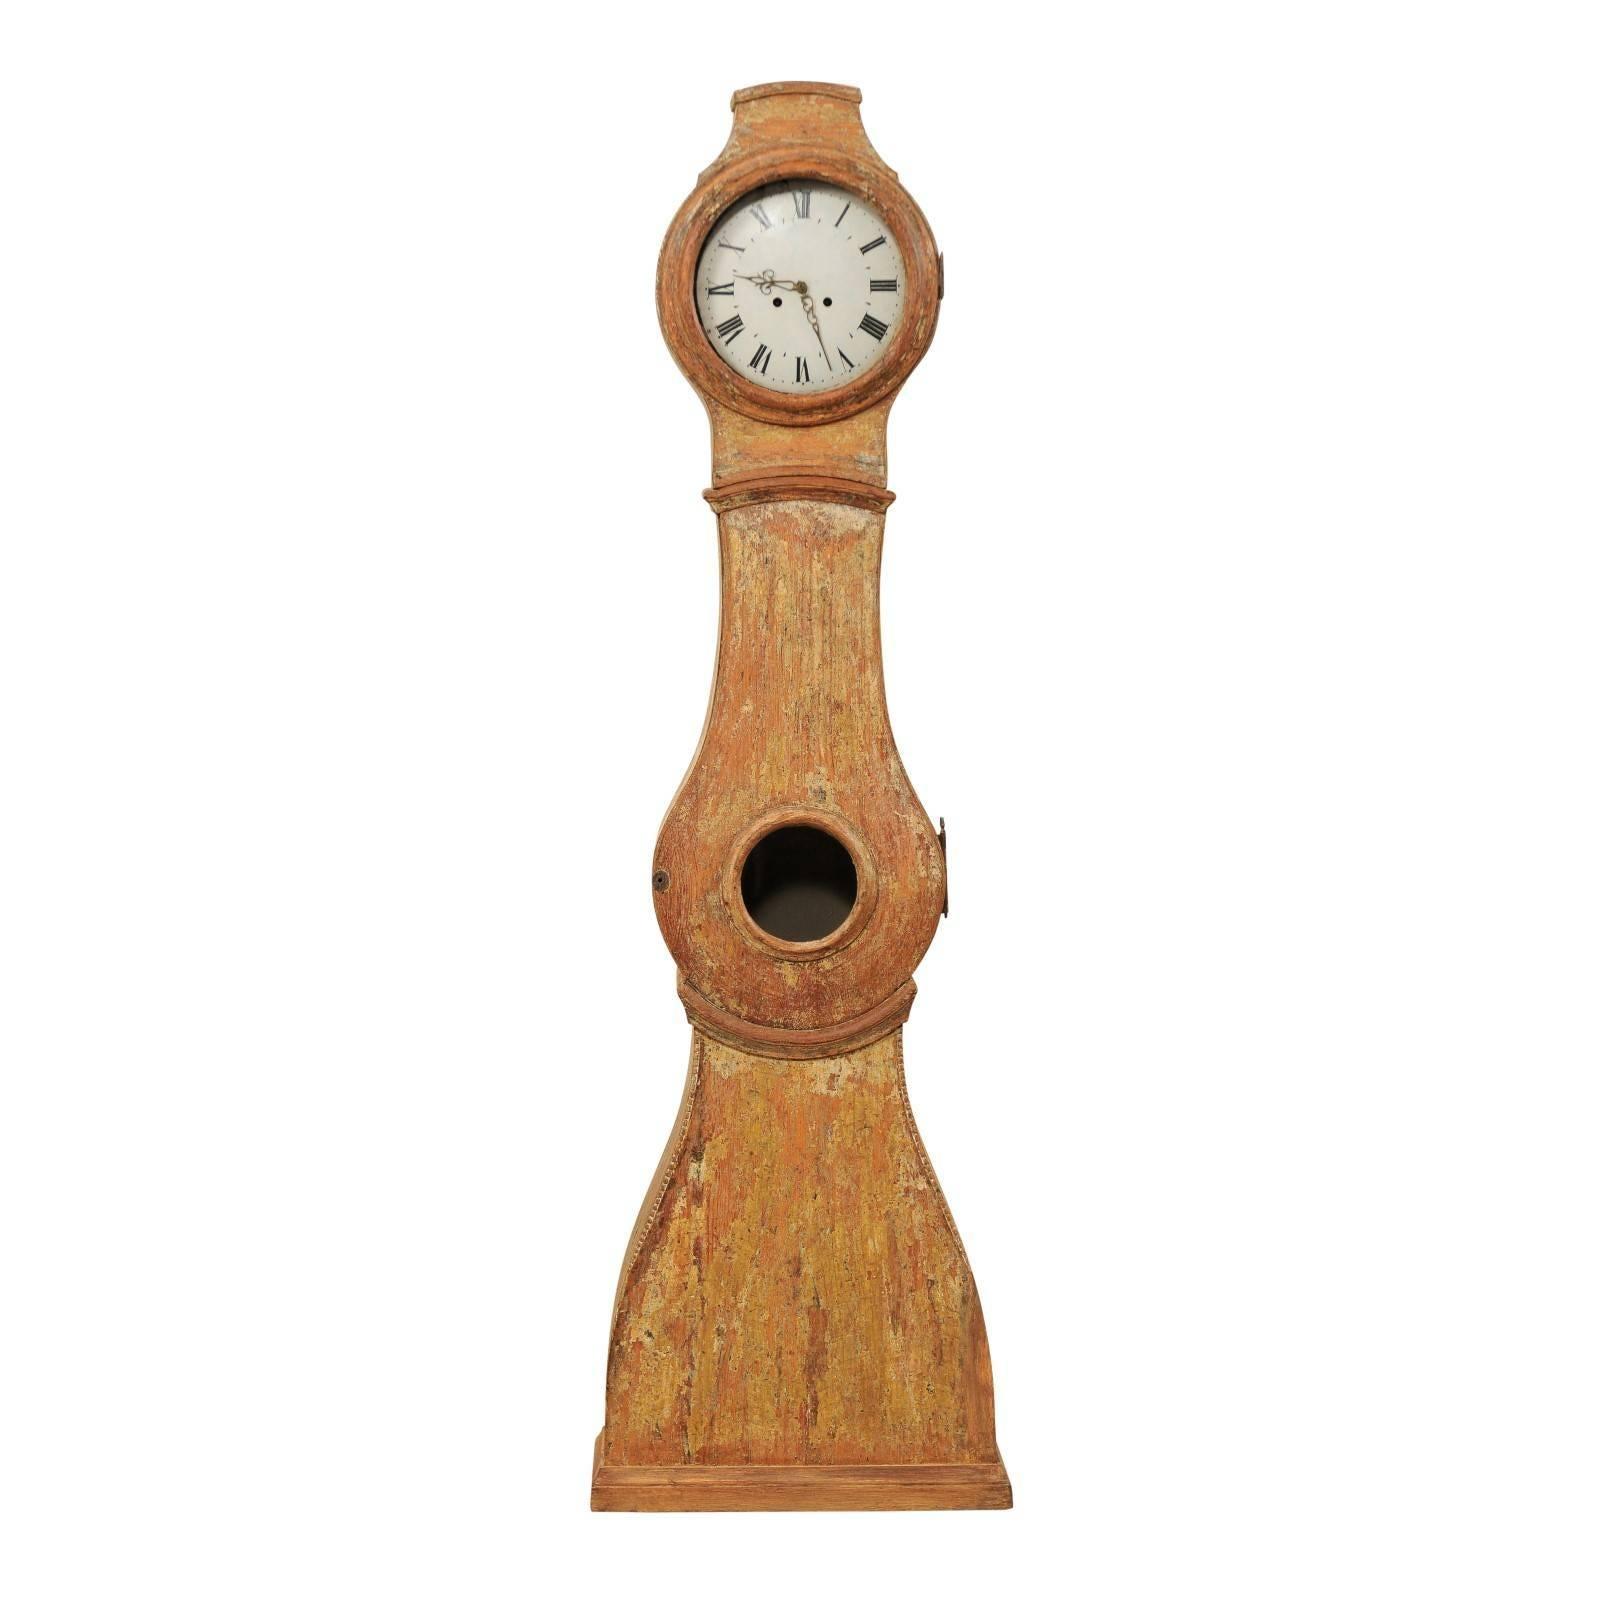 19th Century Swedish Painted Wood Longcase / Floor Clock with Scraped Finish